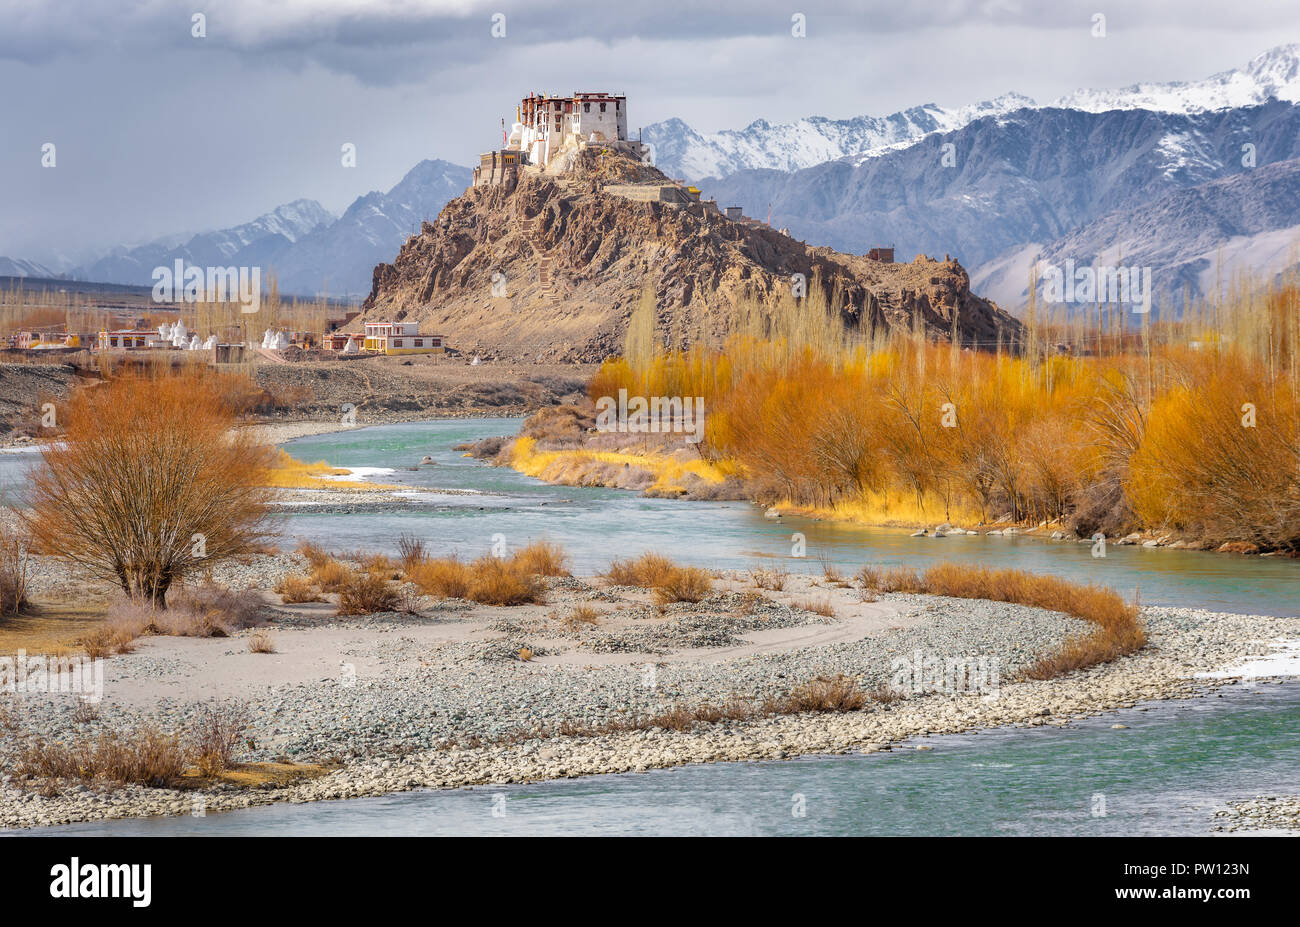 India Leh Ladakh, Matho monastery in Ladakh, Jammu and Kashmir, India. Beautiful nature, aqua river surrounded by brown golden trees and himalaya moun - Stock Image